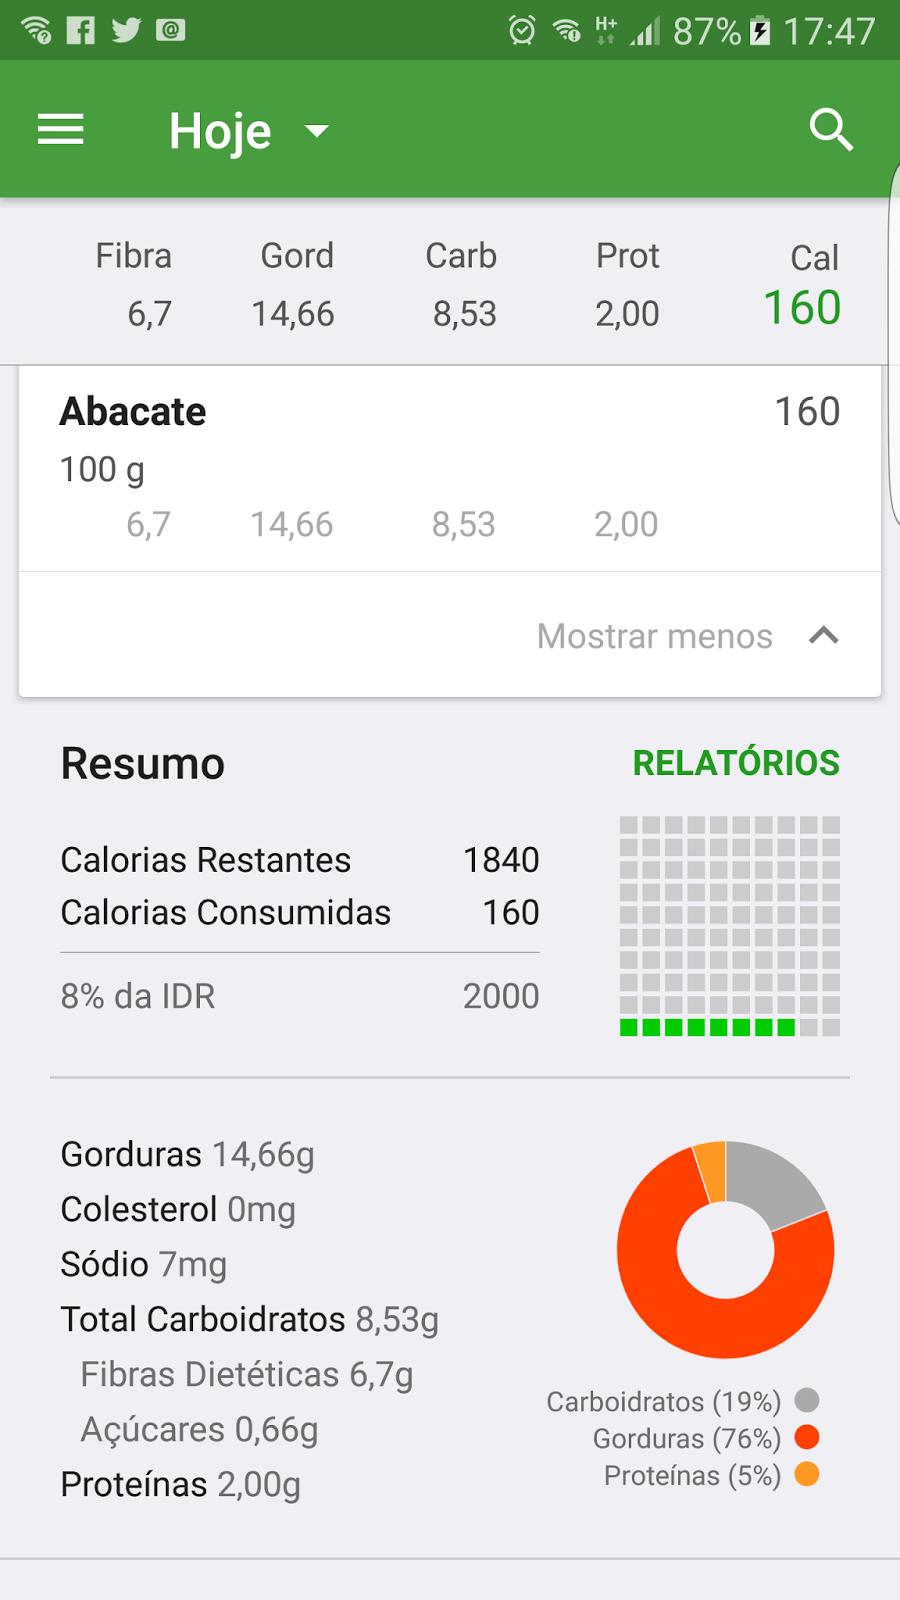 Dieta cetogenica calcular calorias